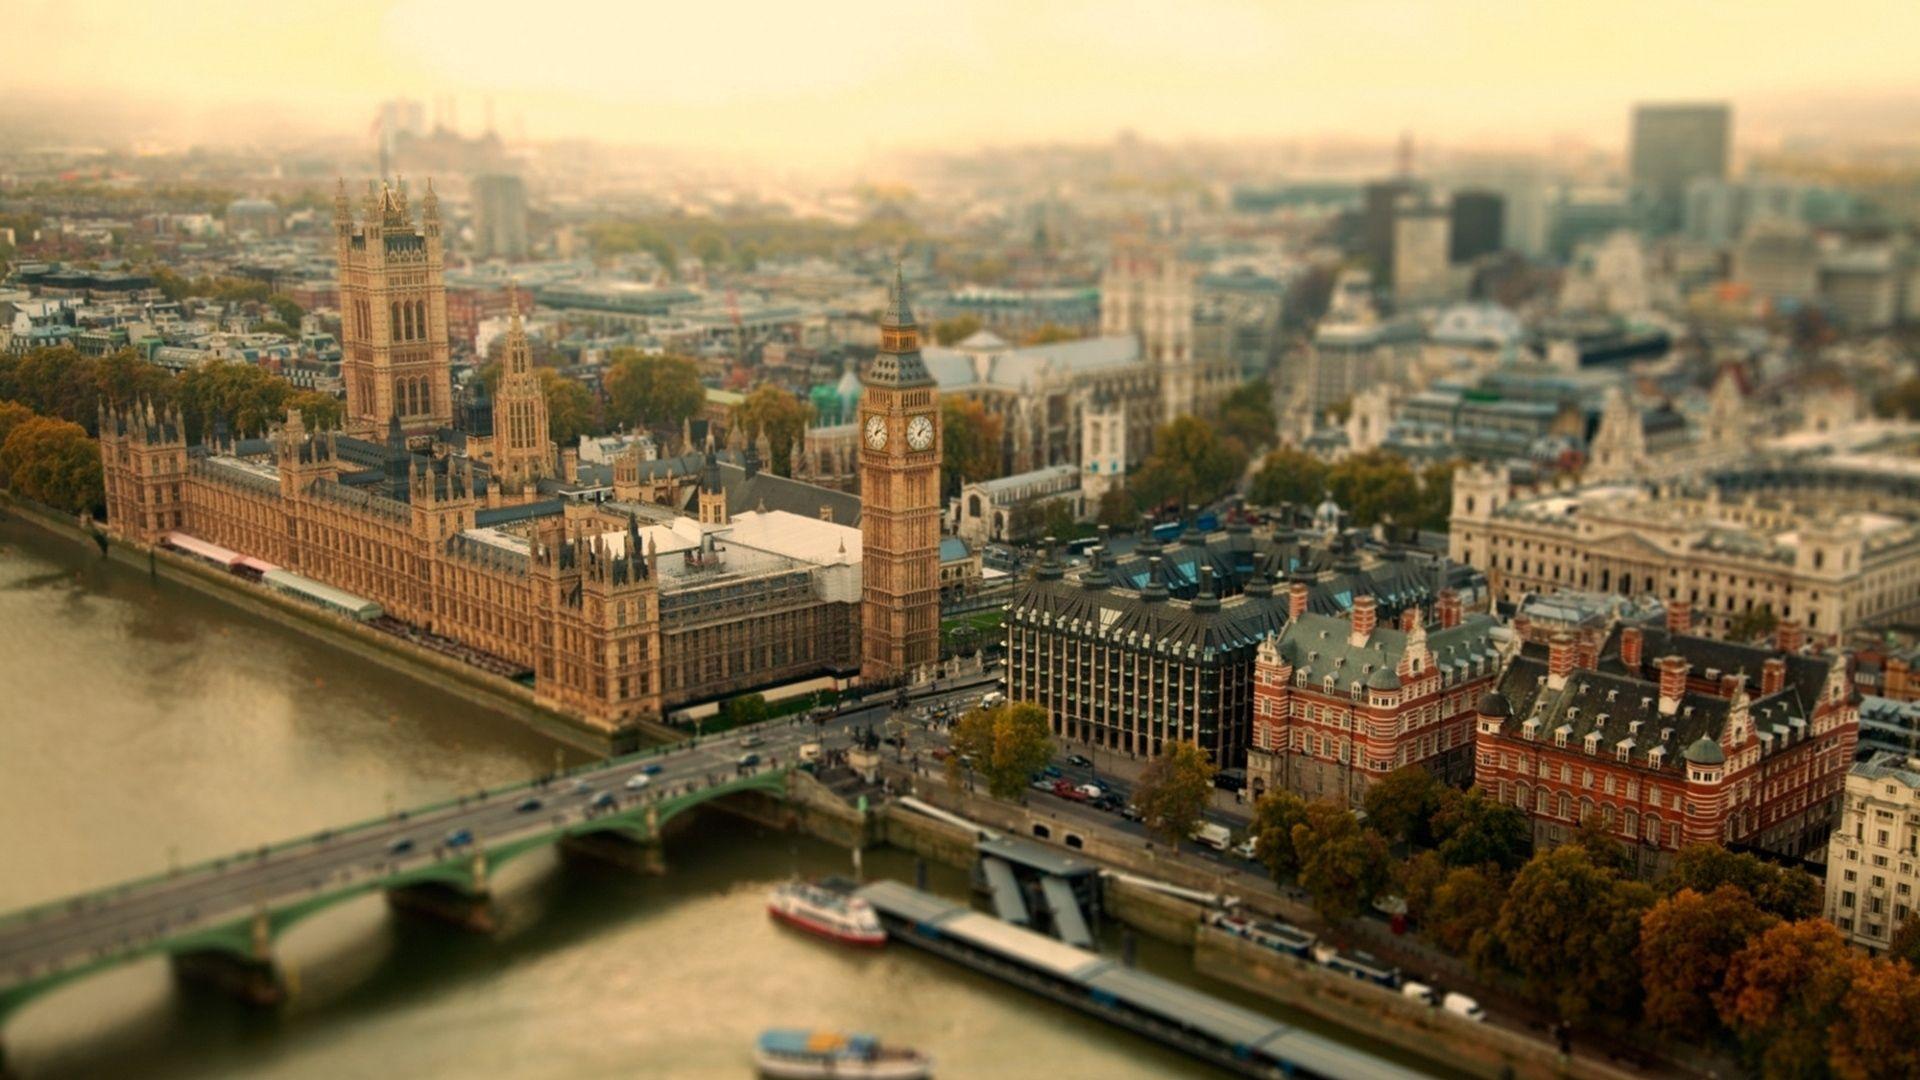 Downloadlondon, Uk, City, Tower Bridge Wallpaper, Background